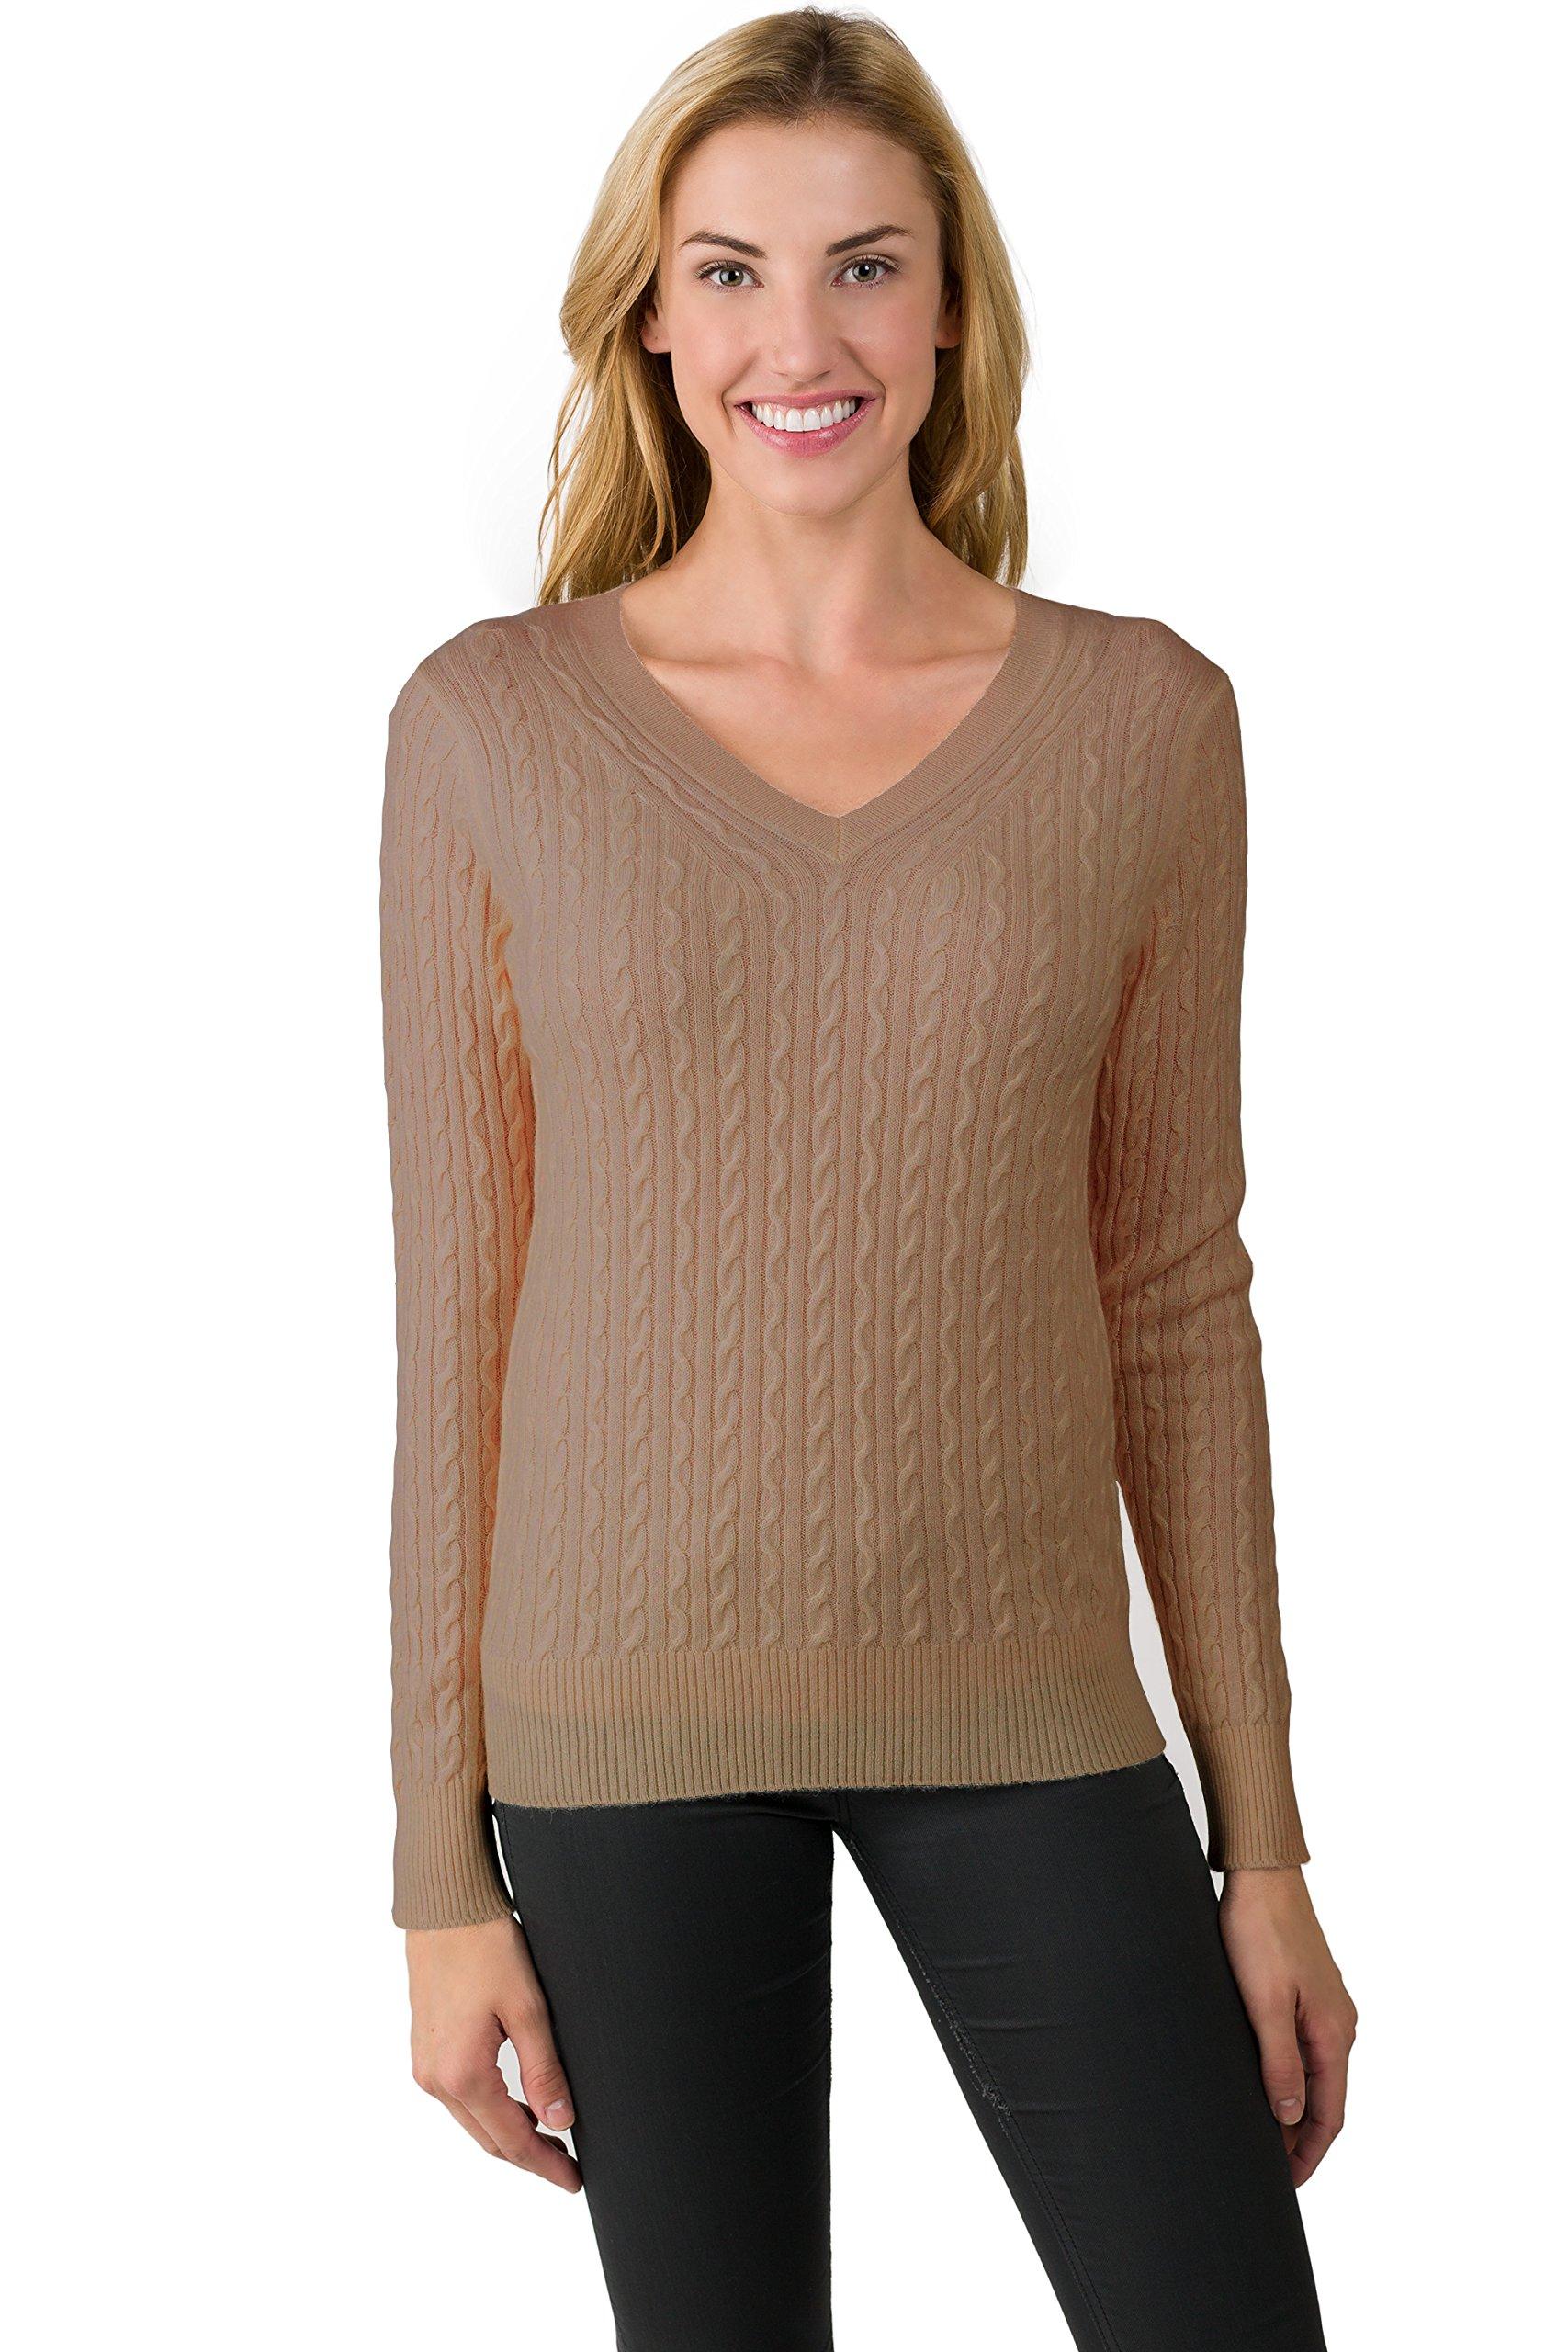 JENNIE LIU J Cashmere Women's 100% Cashmere Pullover Cable-Knit V-Neck Sweater (Large, Camel)